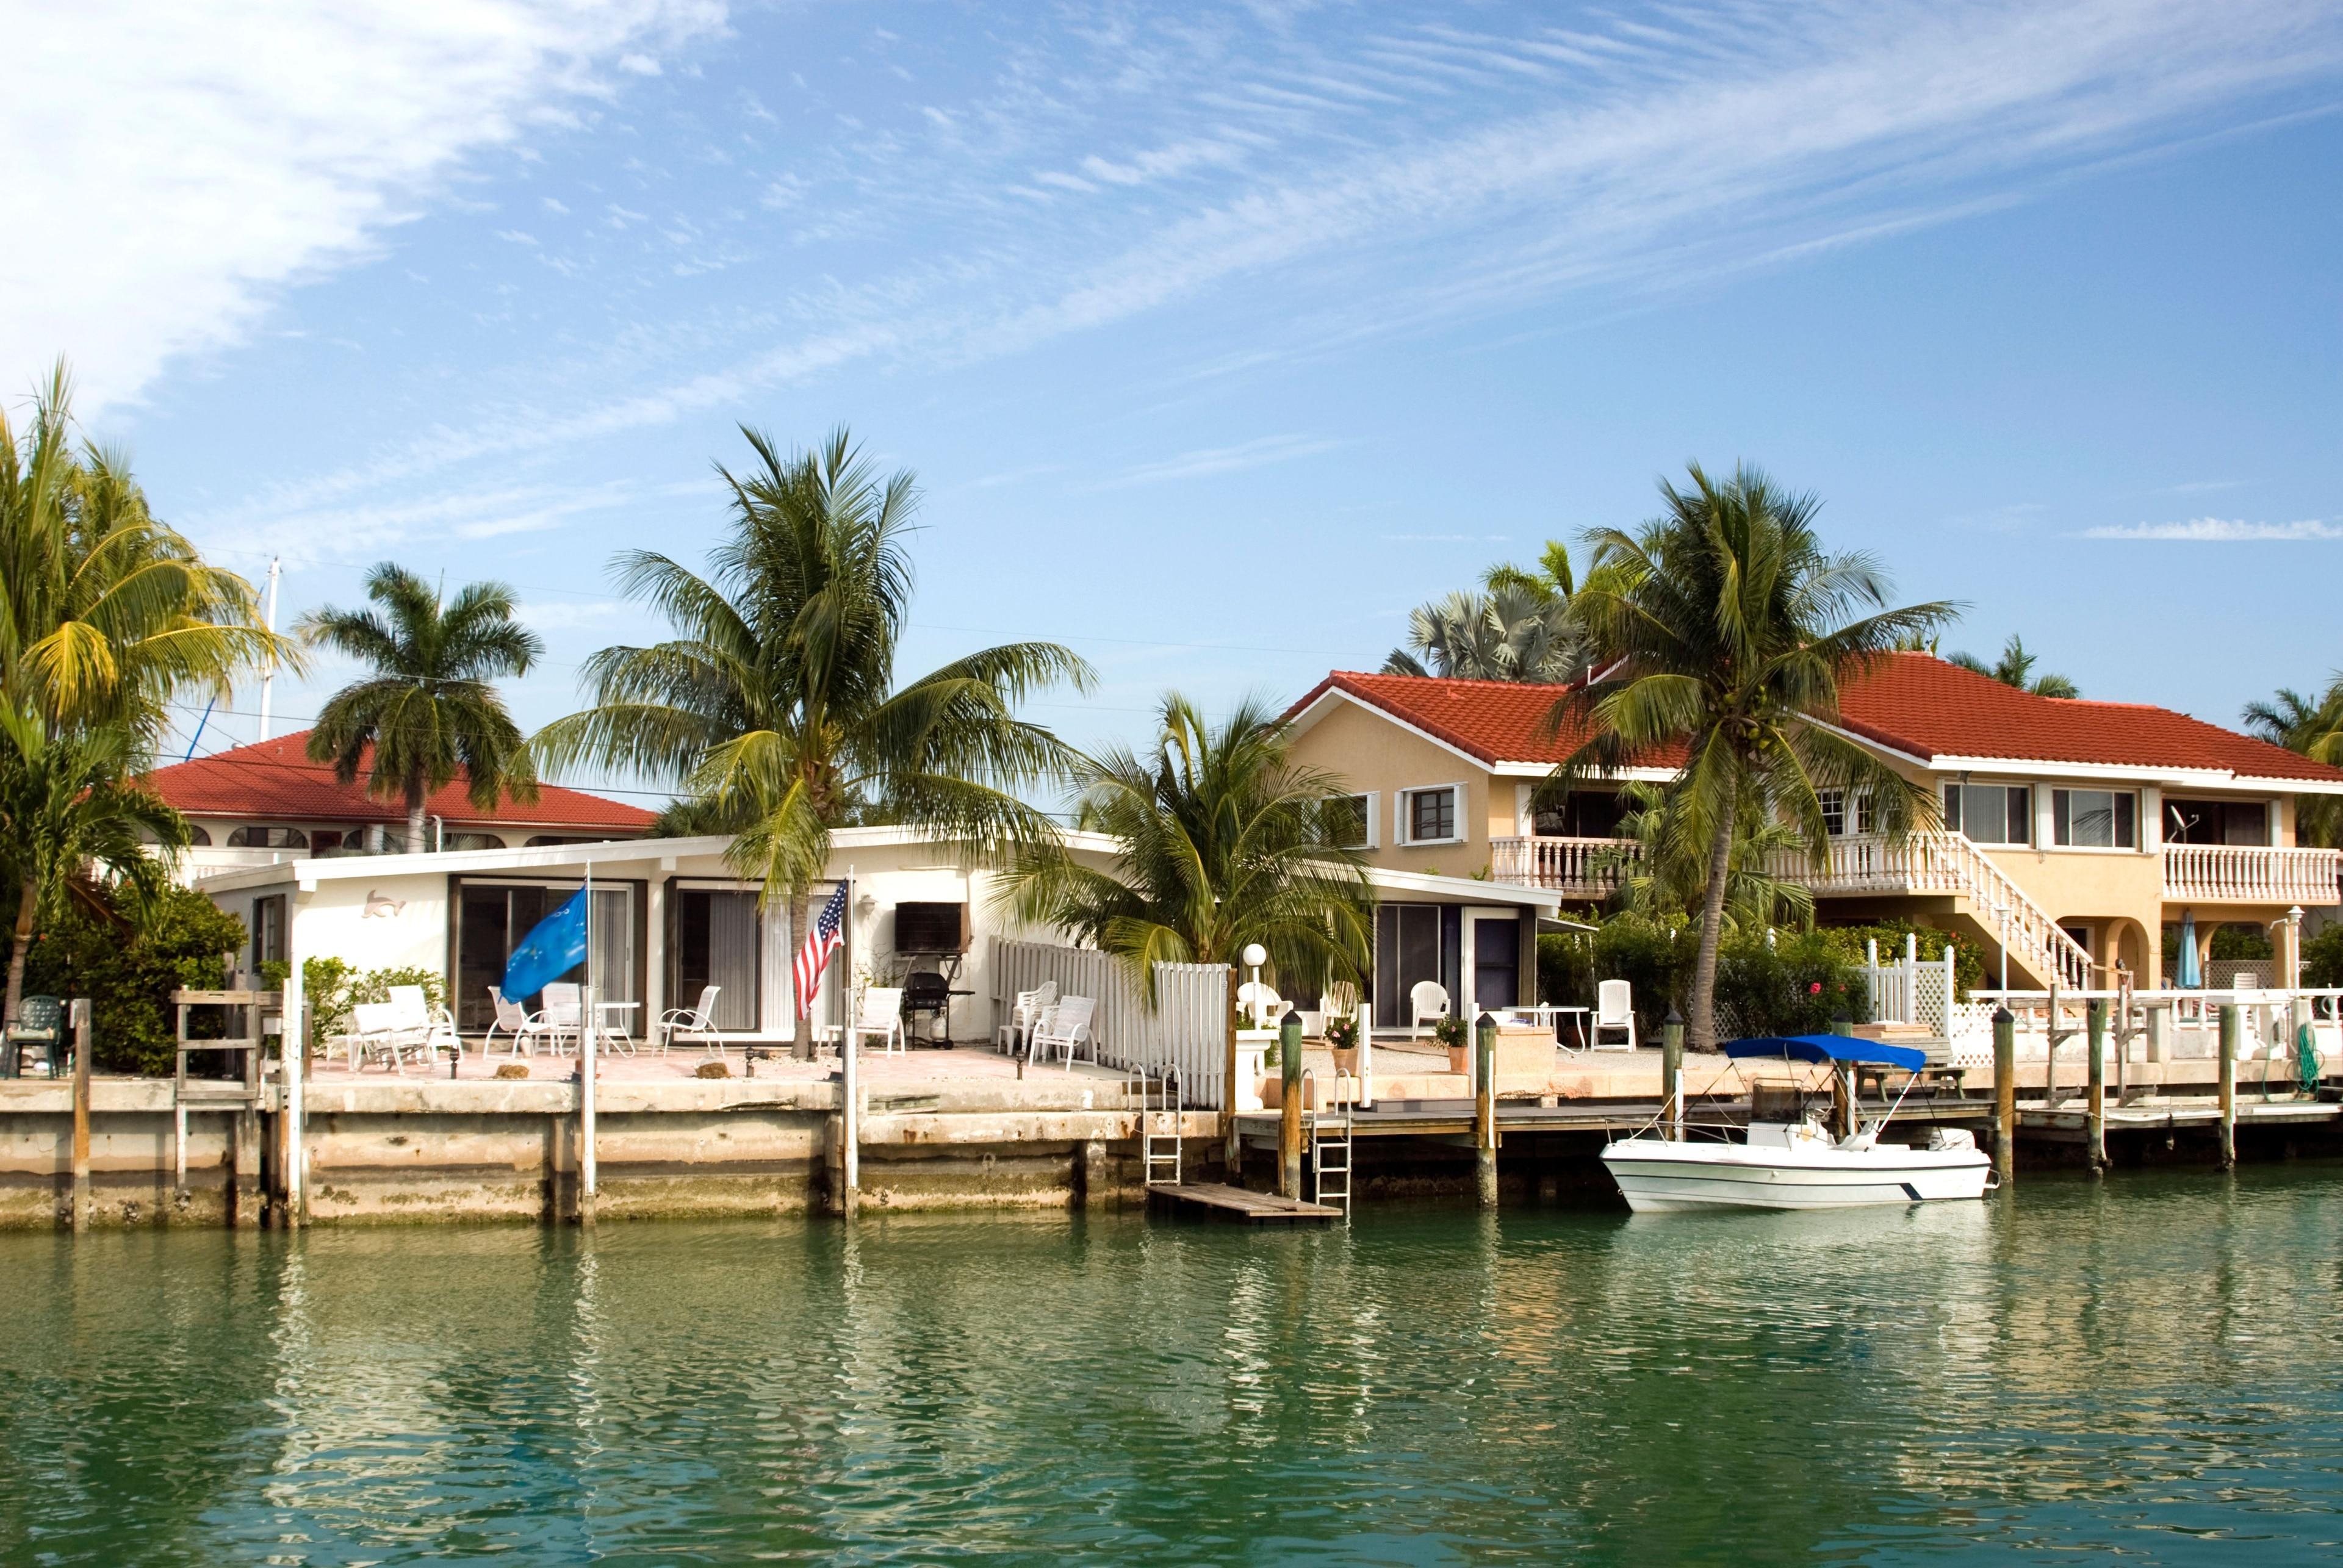 Key Colony Beach, Florida, United States of America